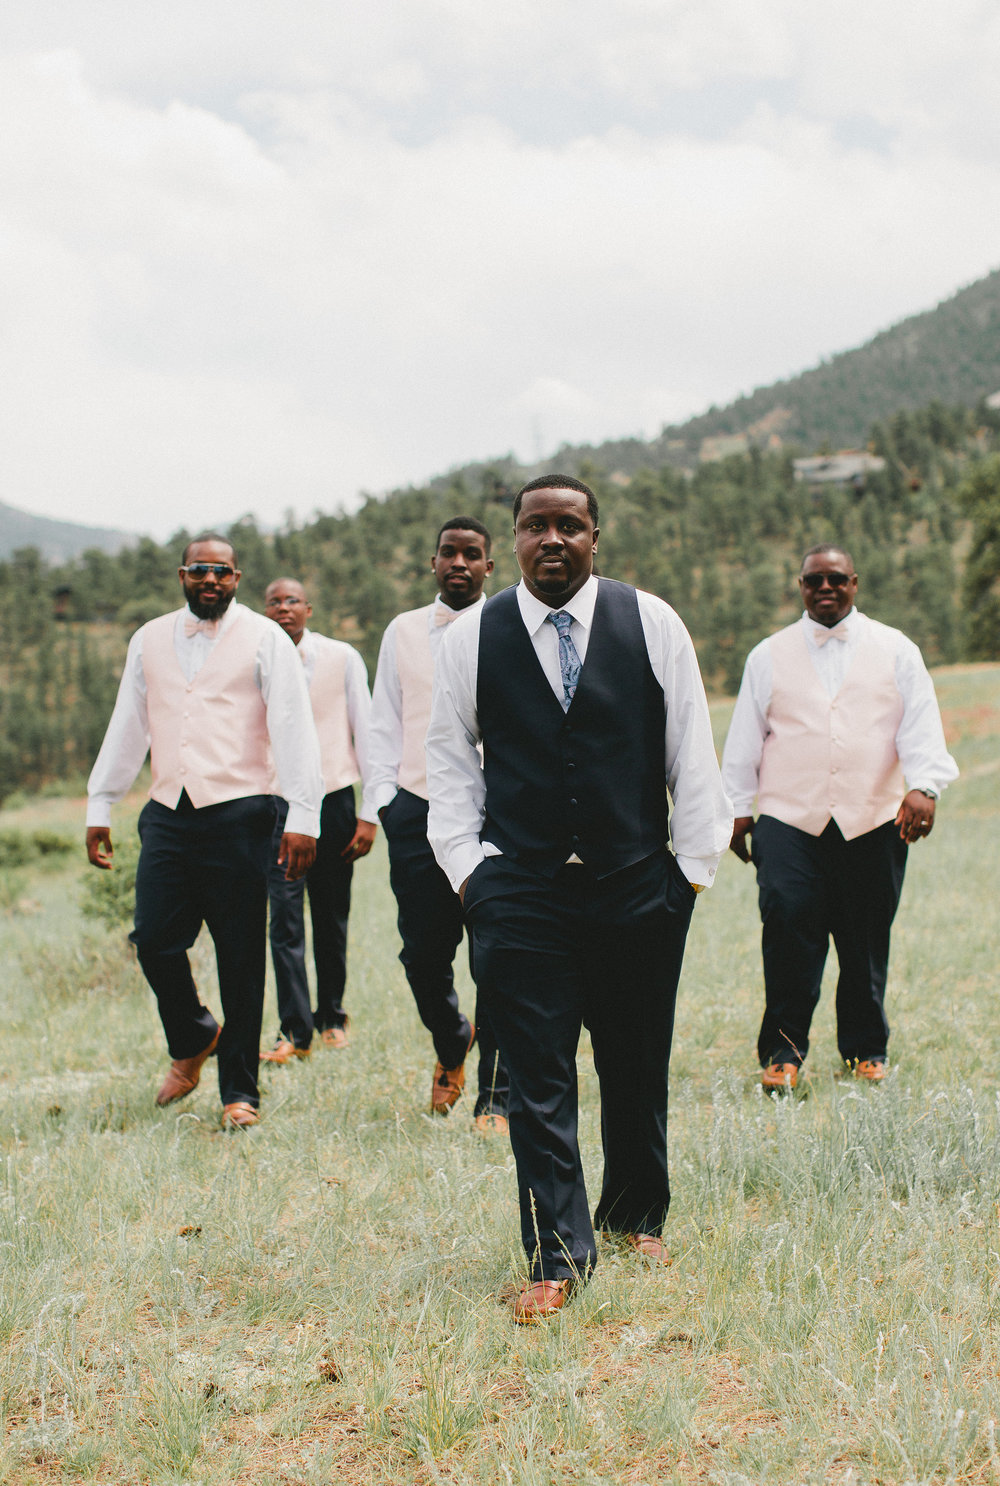 knm-portraits-alvina-valenta-9451-blush-wedding-dress-ti-adora-7552-loveland-colorado-wedding-mountain-wedding-ivory-and-beau-bridal-boutique-savannah-wedding-dresses-savannah-bridal-boutique-savannah-bridal-gowns-savannah-weddings-11.jpg